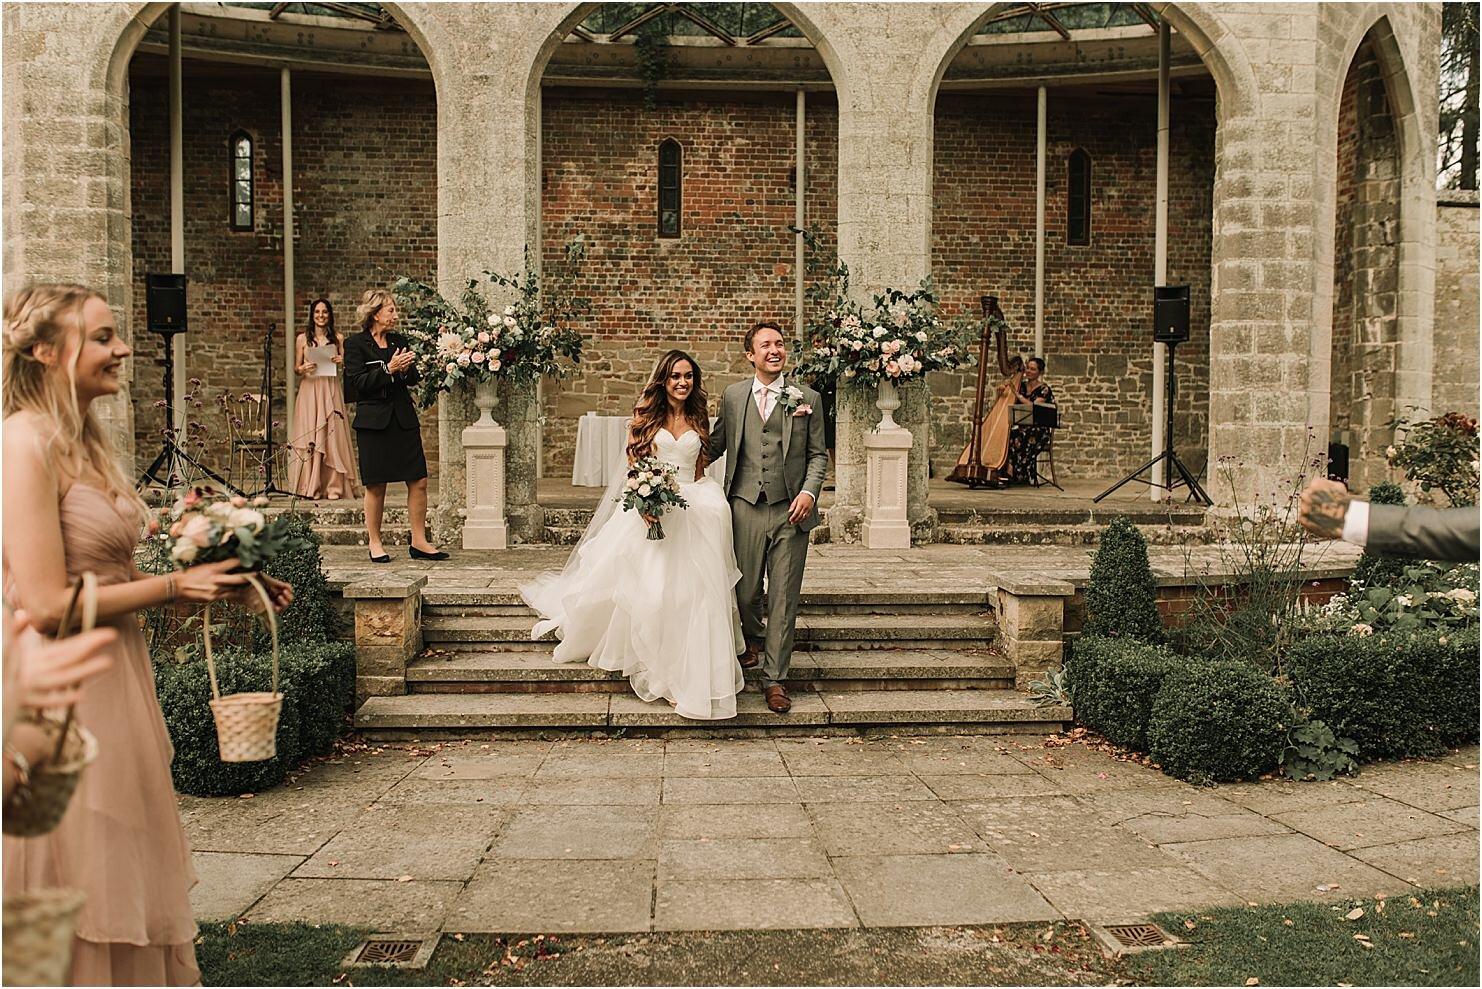 boda-de-cuento-en-castillo-boda-en-londres-59.jpg